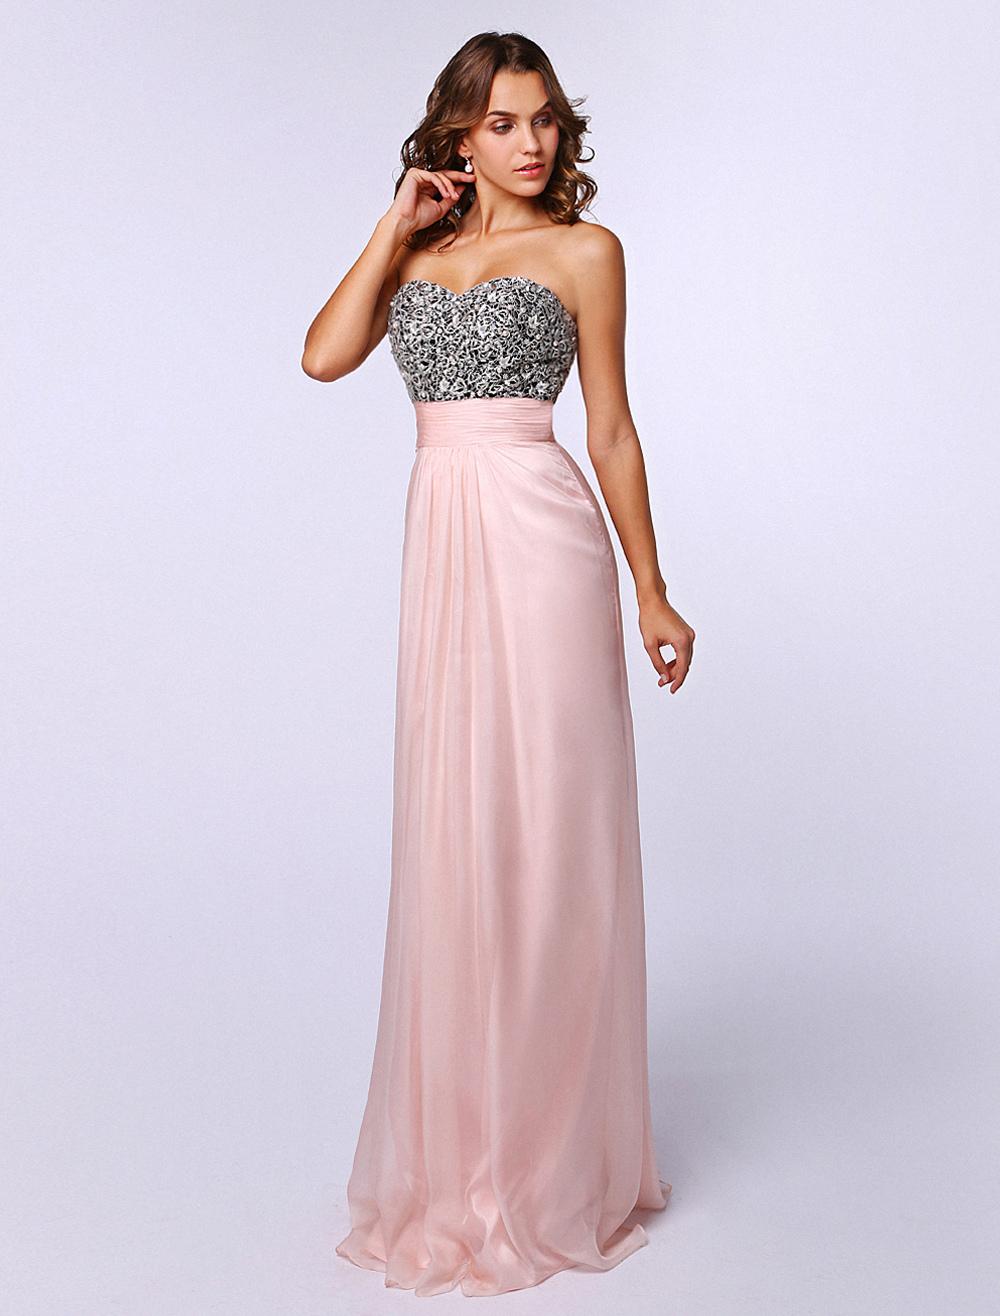 Pink Sweetheart Neck Sleeveless Pearls Elastic Silk Sheath Prom Dress (Wedding Prom Dresses) photo